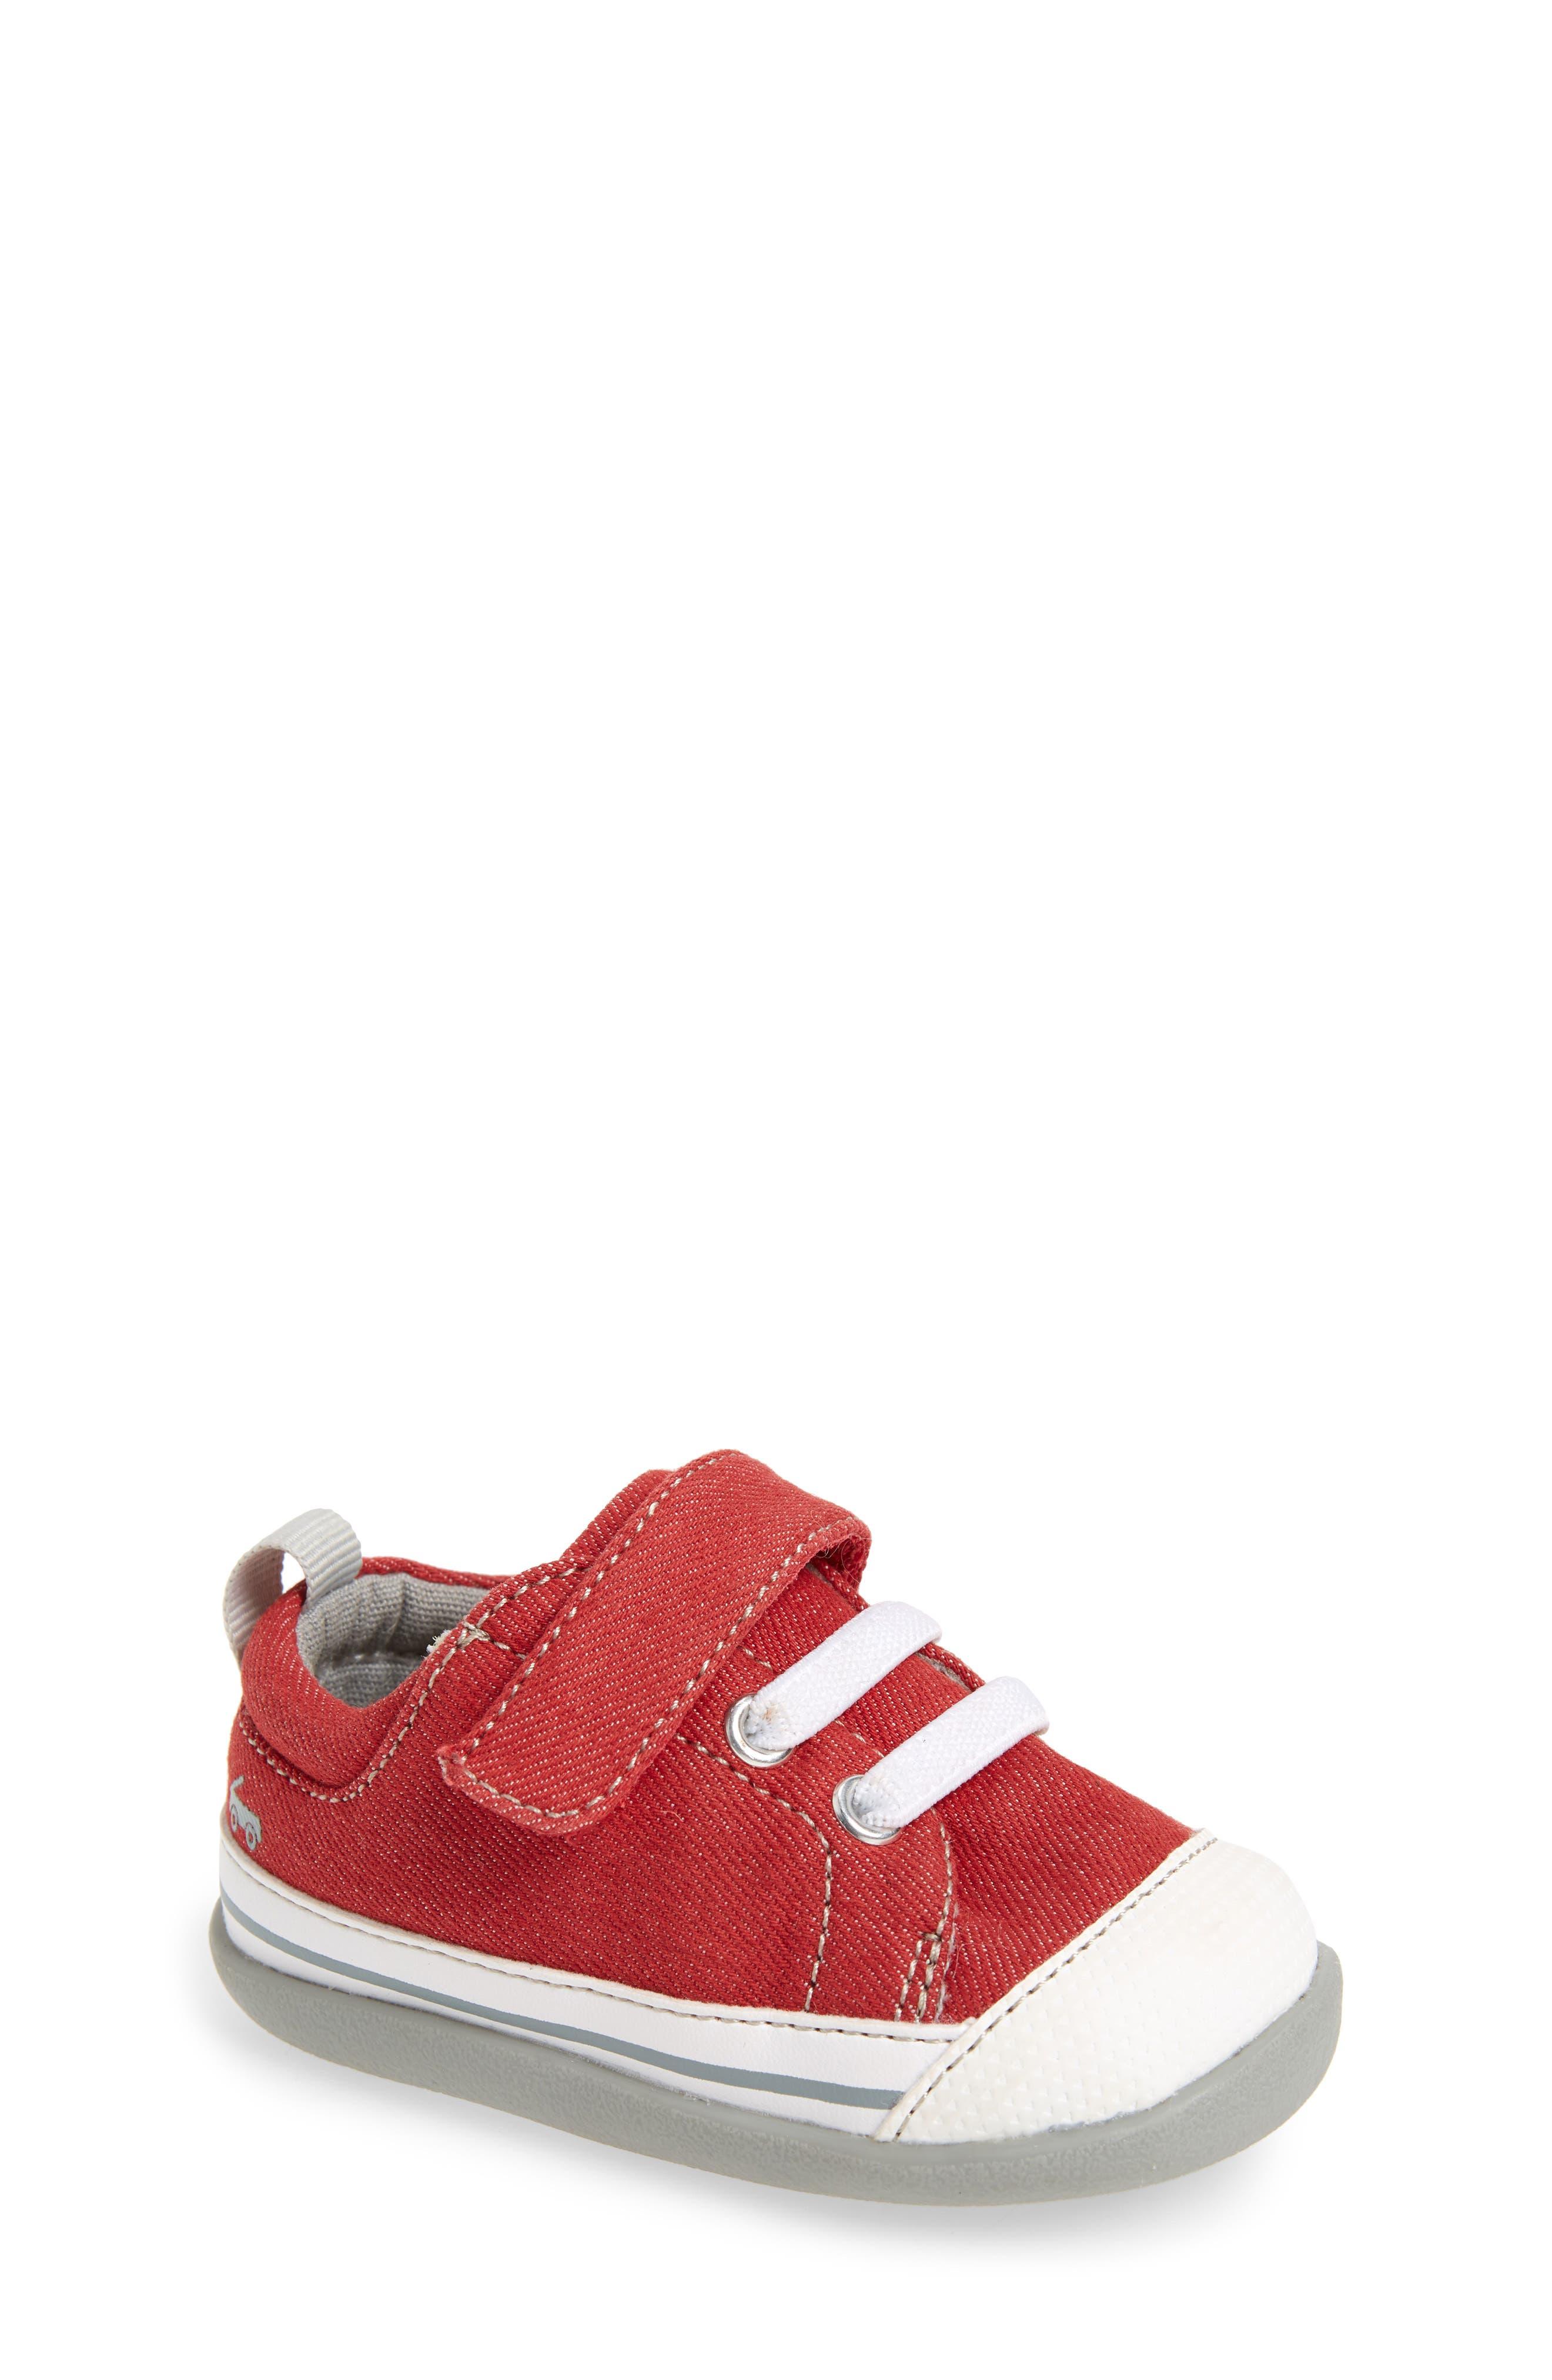 Stevie II Sneaker,                         Main,                         color, Red/ Gray